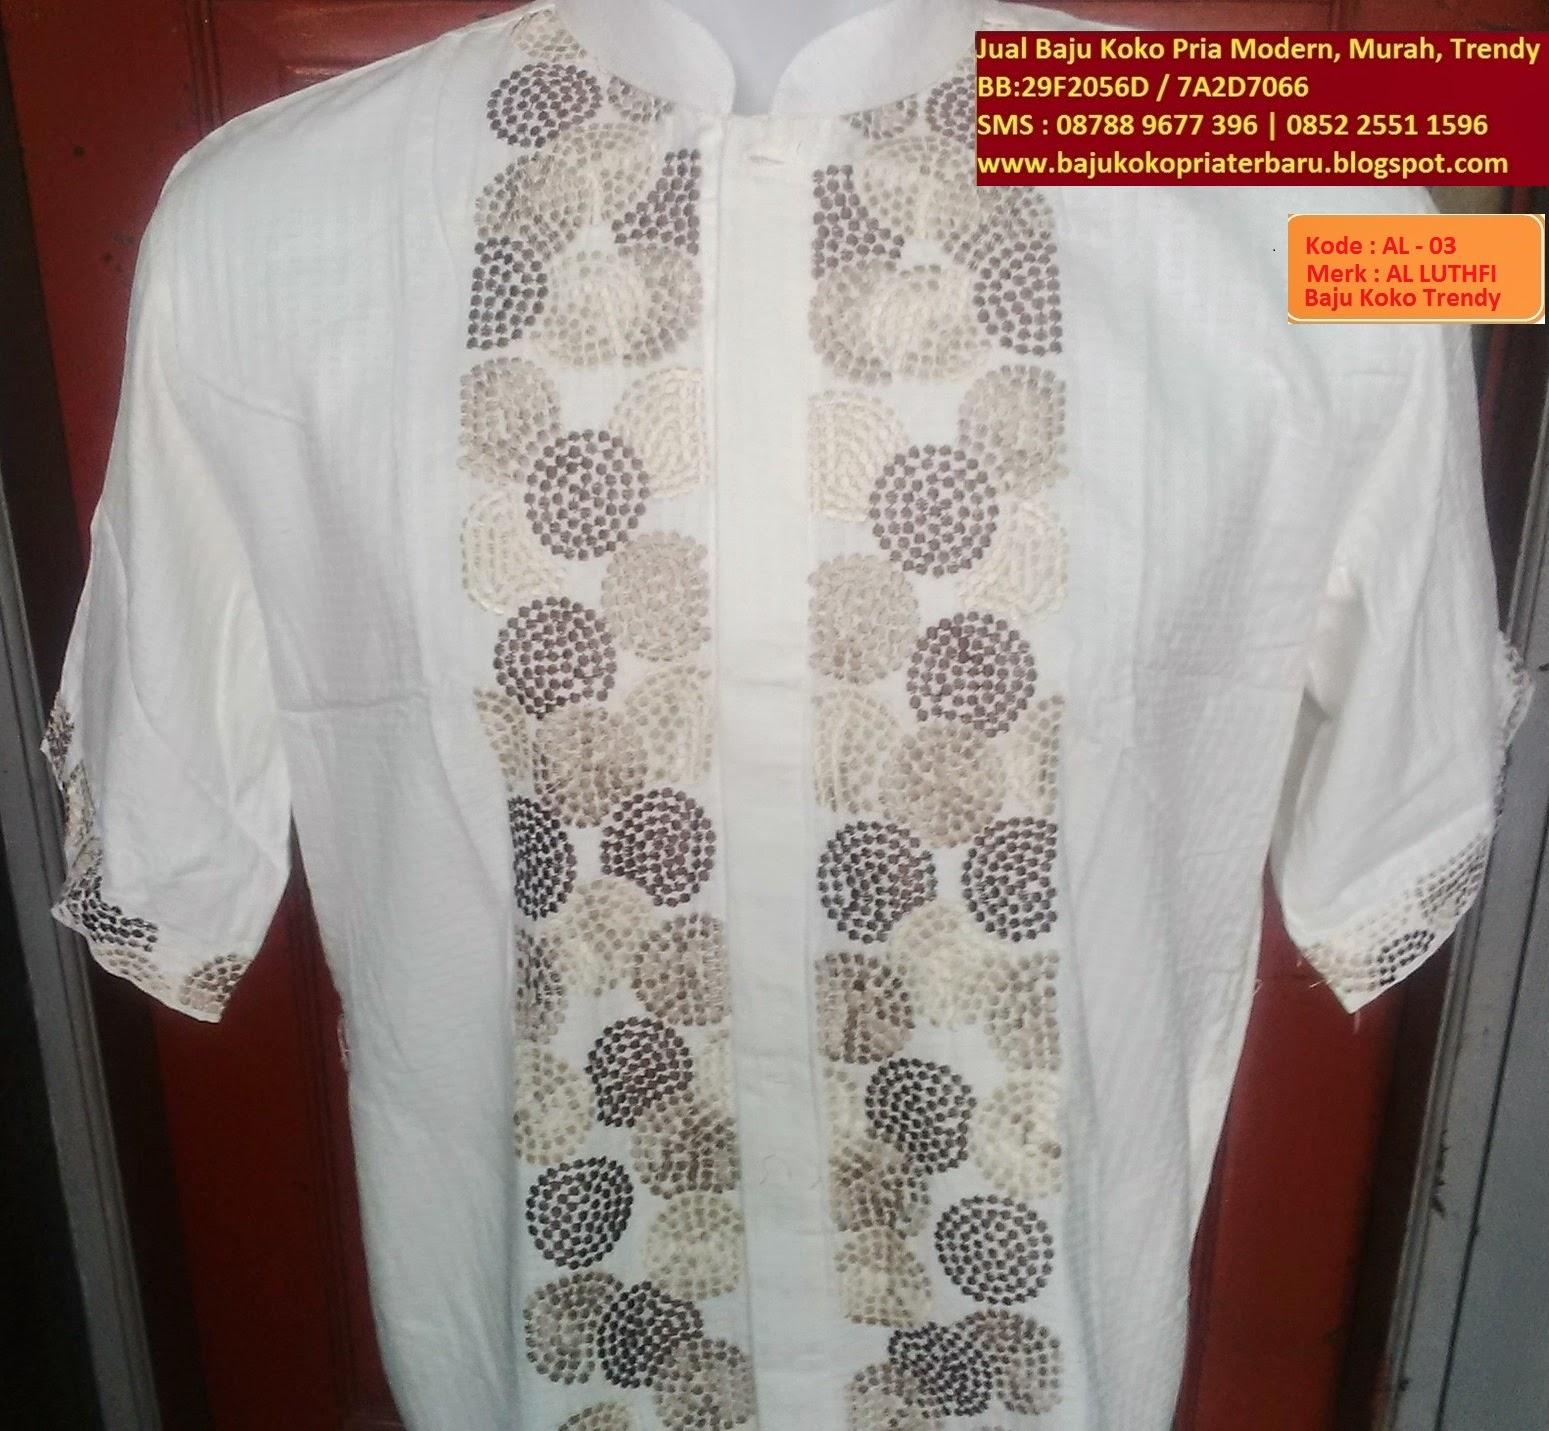 Jual Baju Koko Pria Modern Murah Trendy BB 5E65C8D8